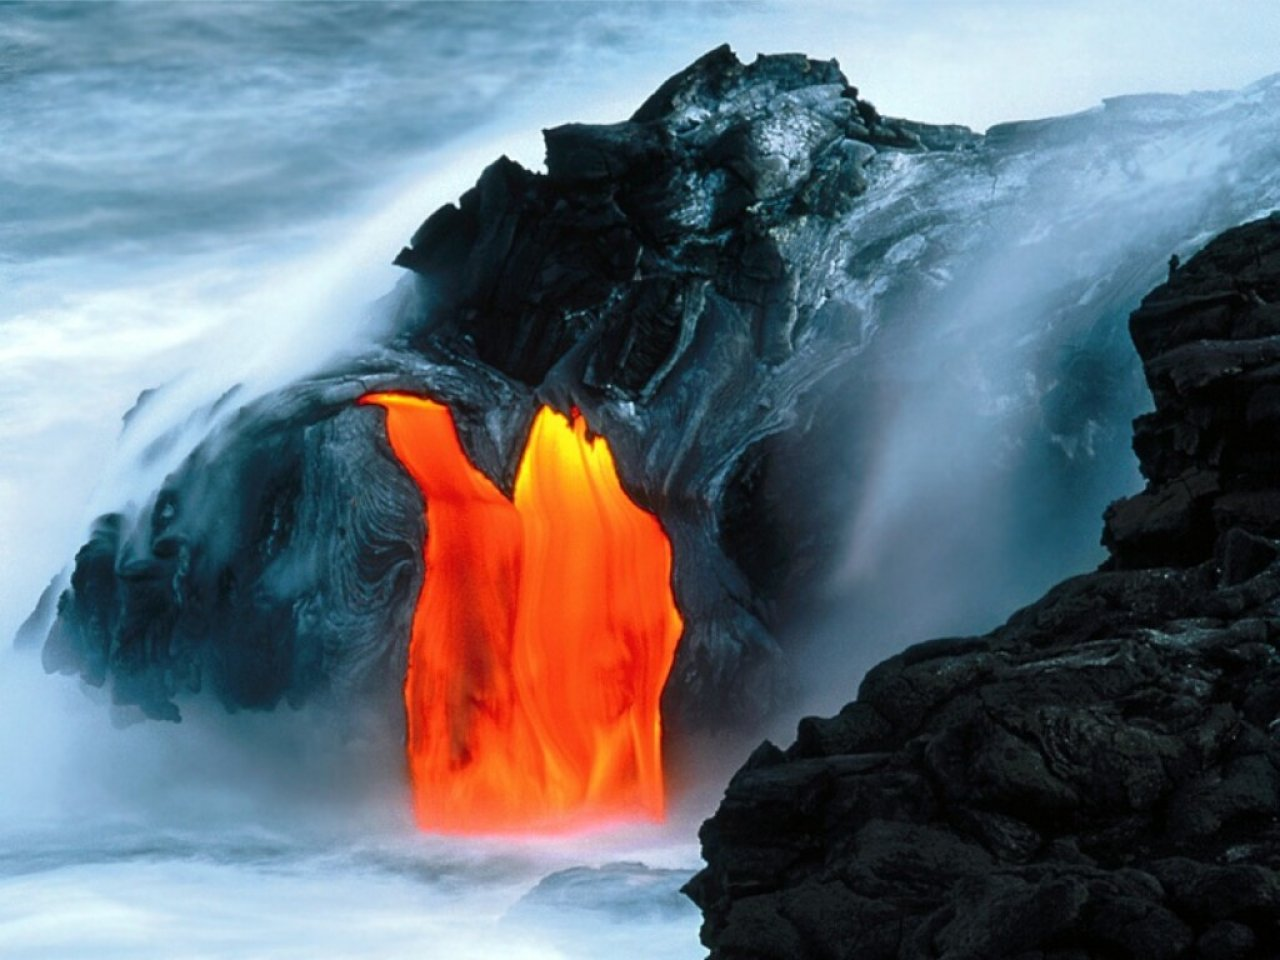 Big Island Volcano Trip: COOL VOLCANO PICTURES